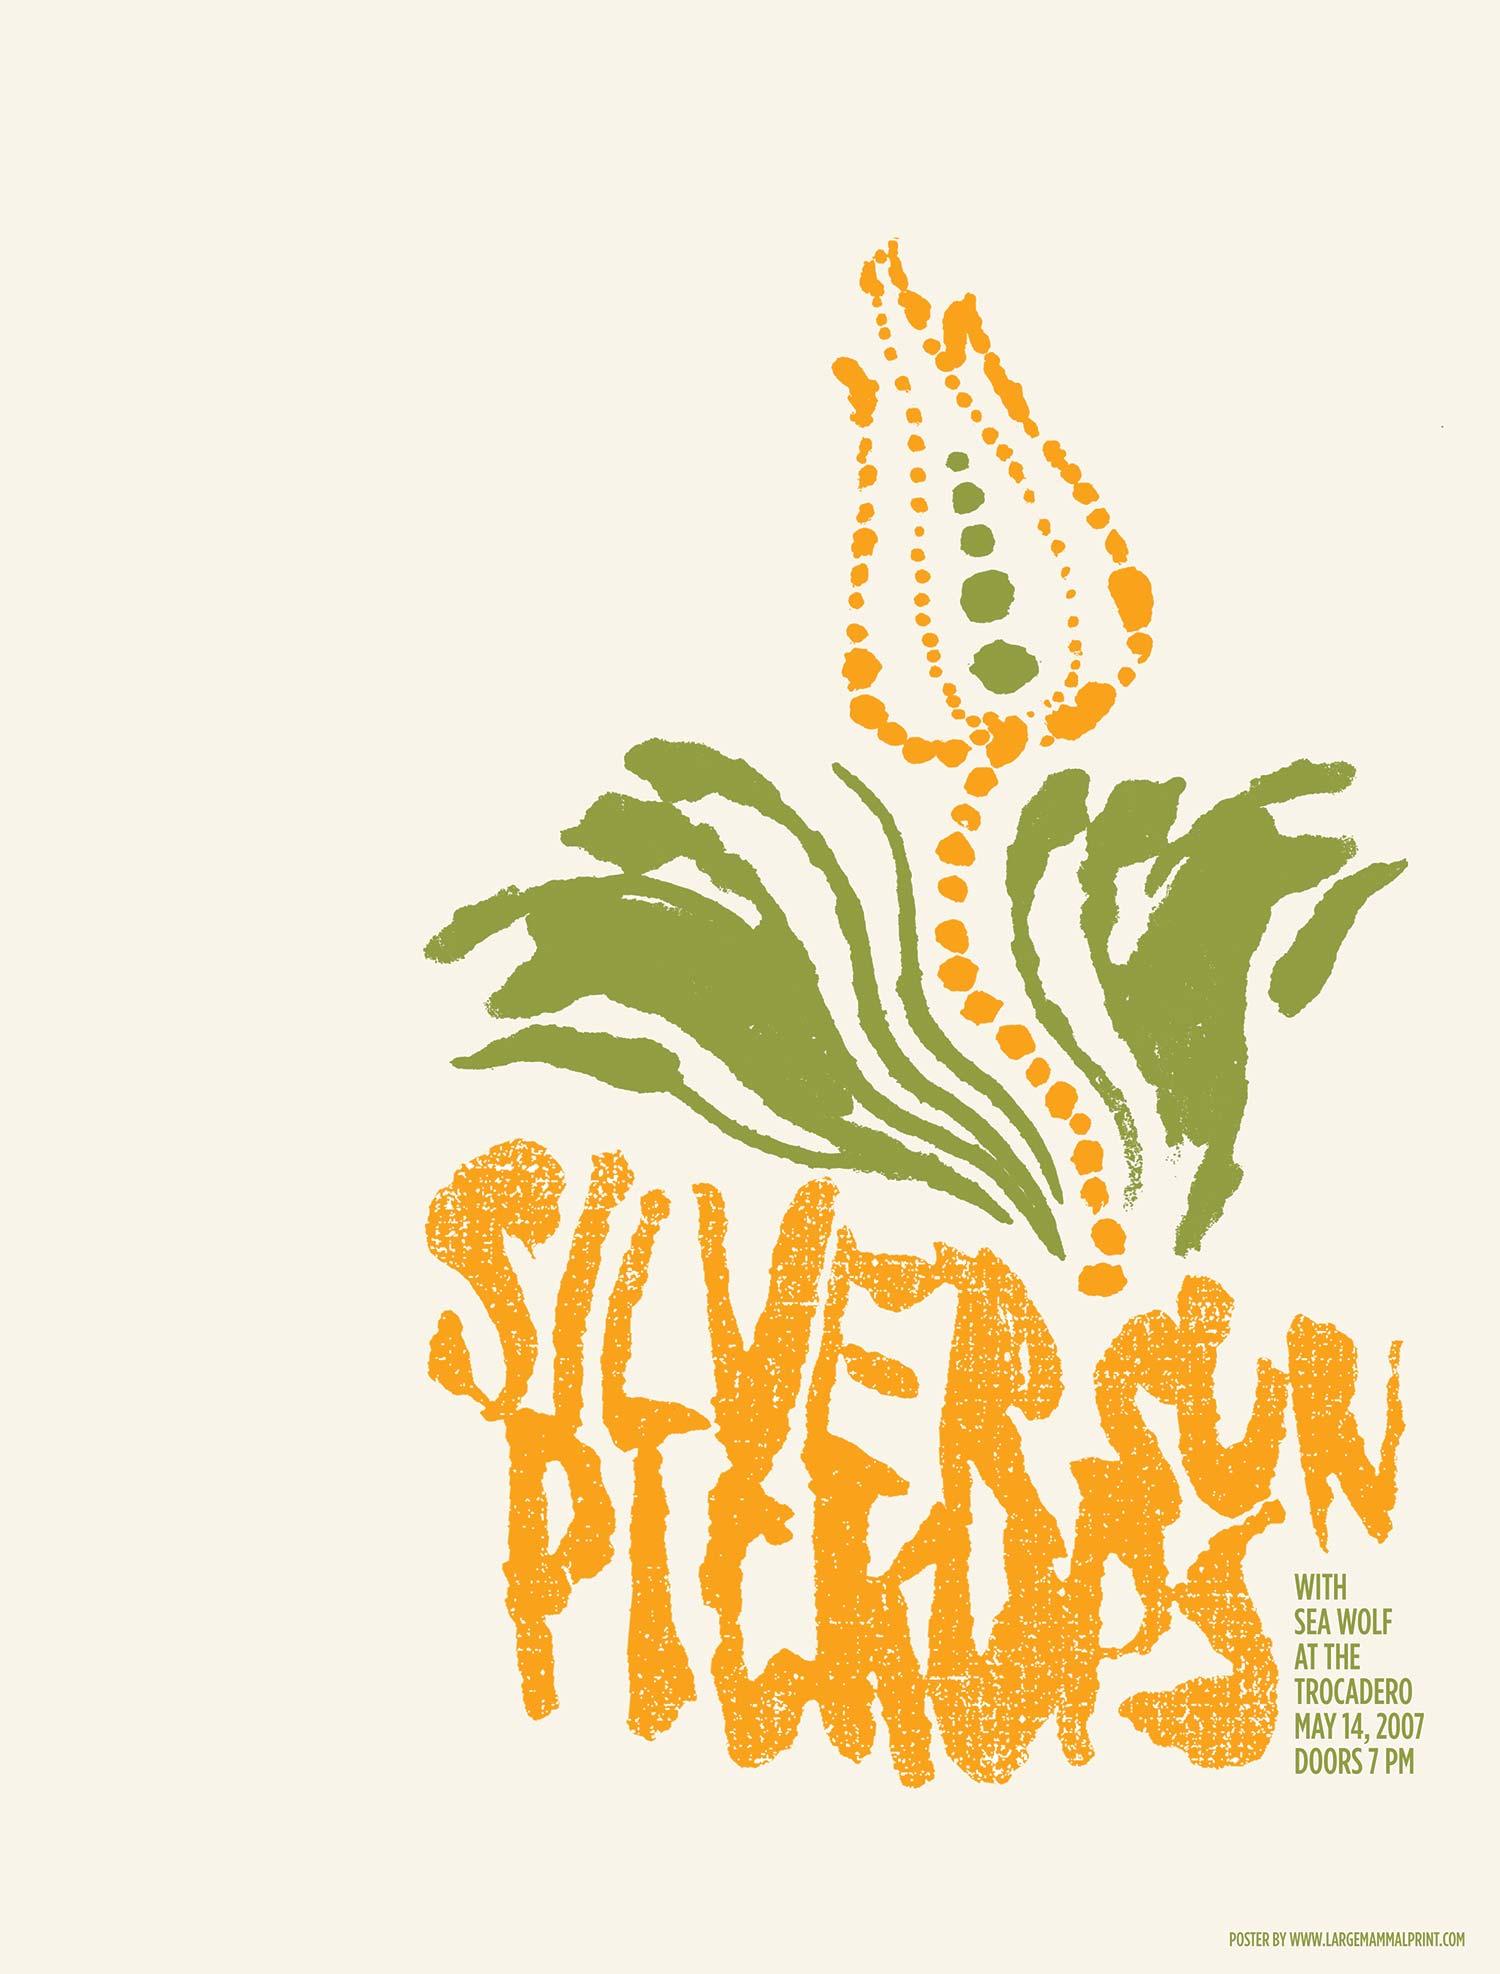 SilversunPickups_1500.jpg